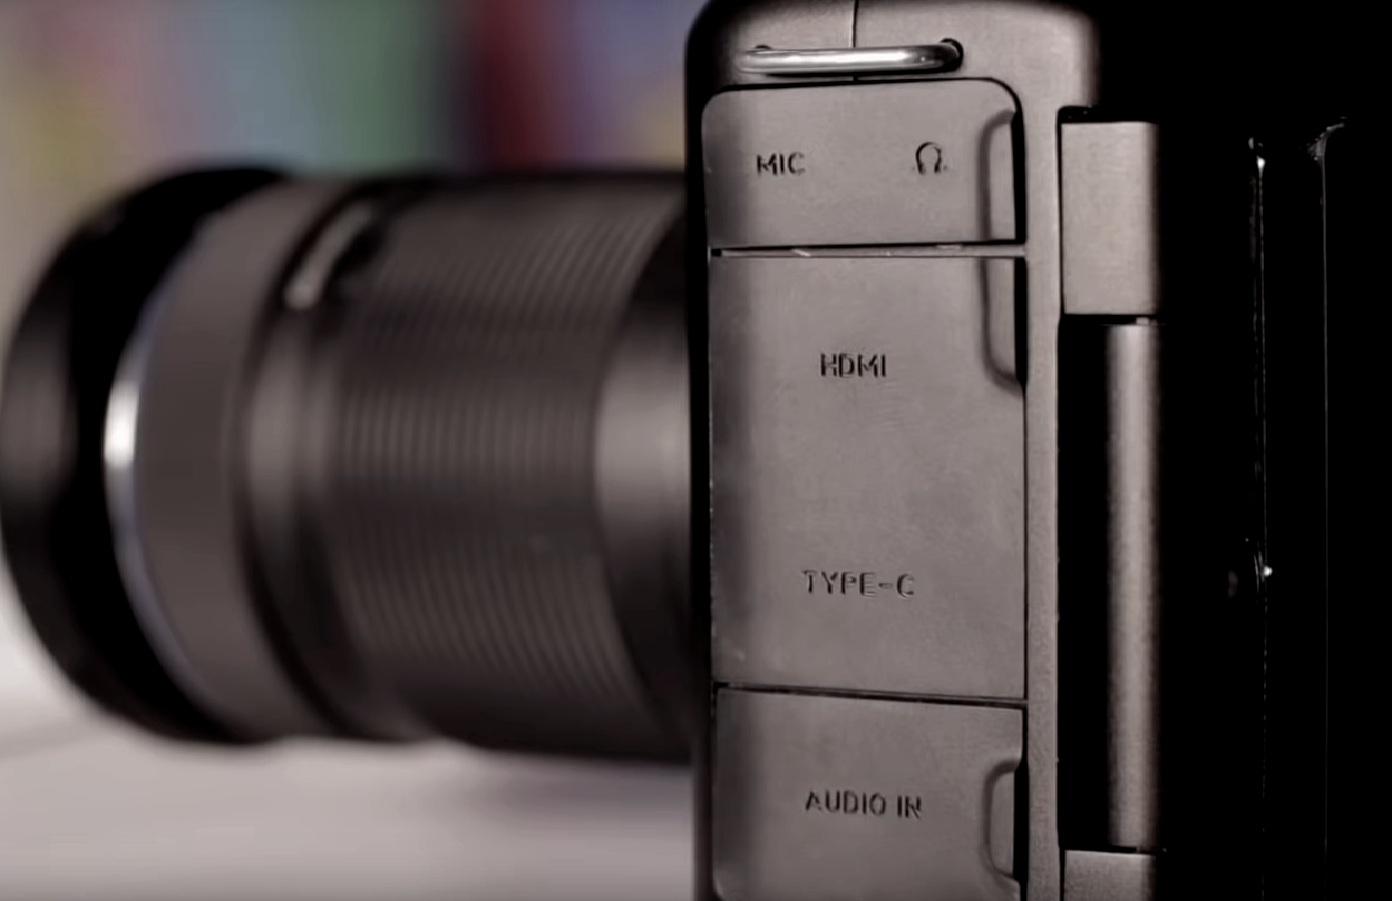 It has a Mini XLR port, full-size HDMI, USB-C, headphone, and a microphone jack.